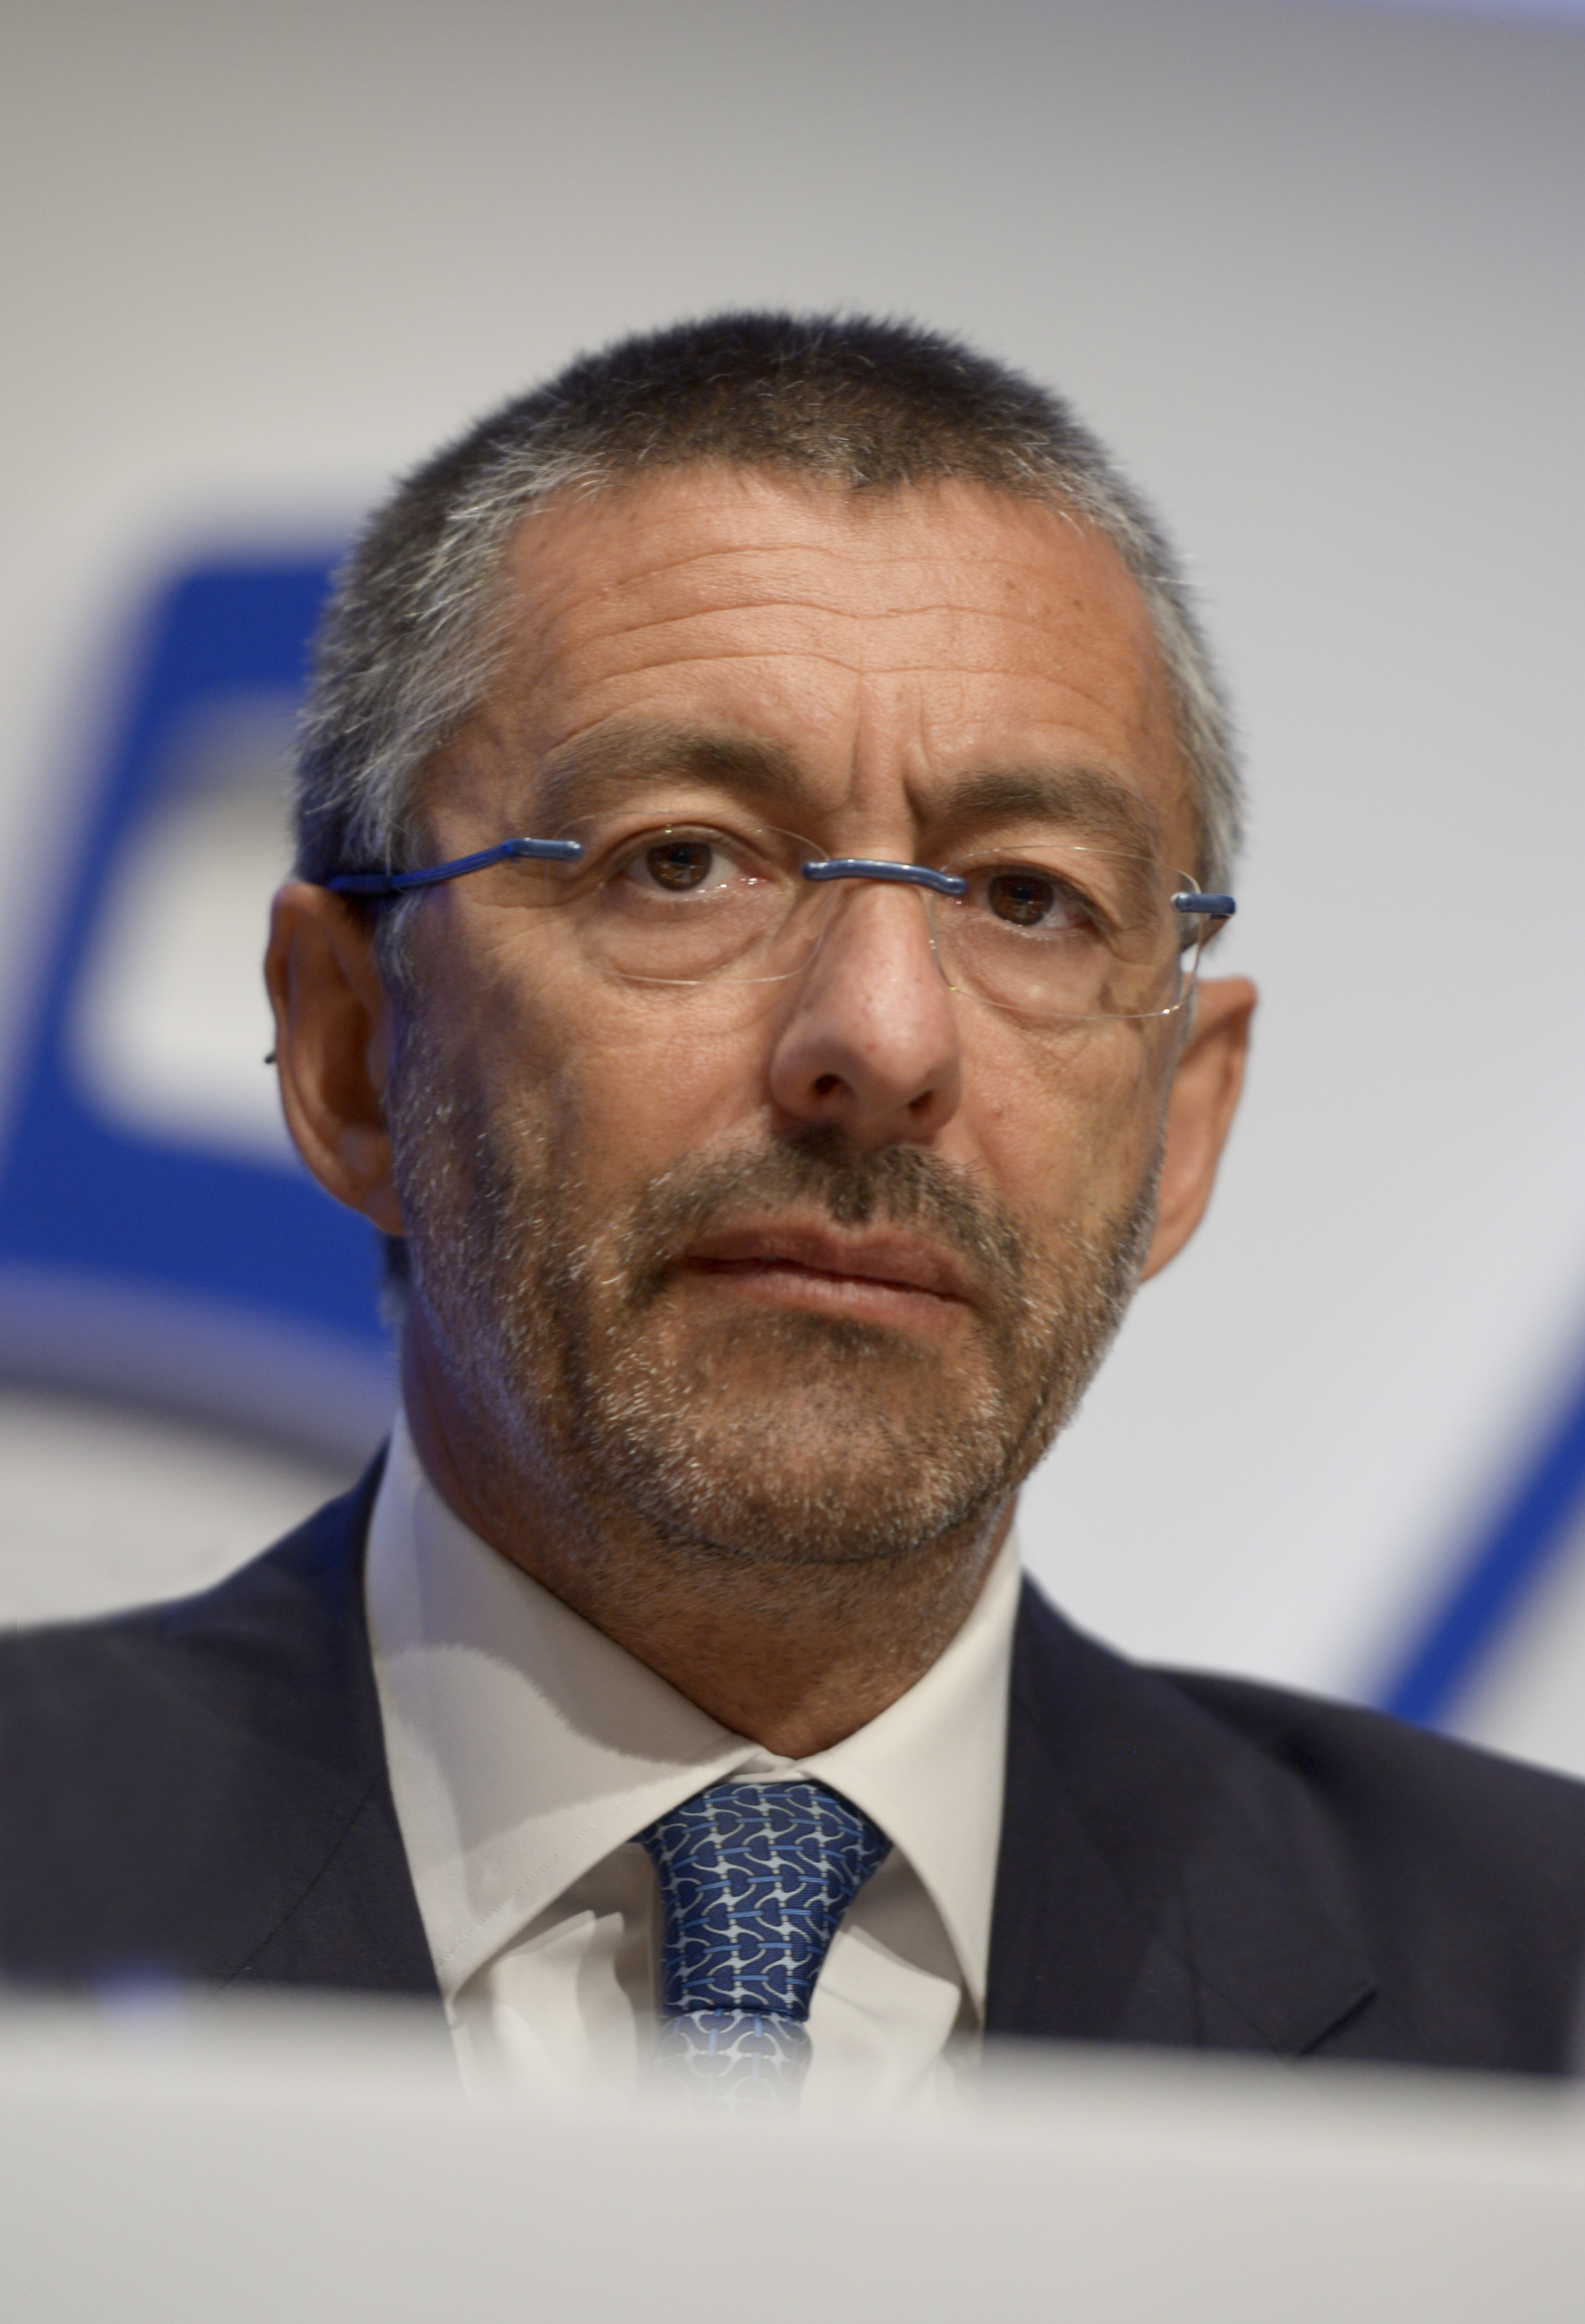 GIOVANNI SABATINI - Unione Bancaria e Basilea 3 - Risk & Supervision